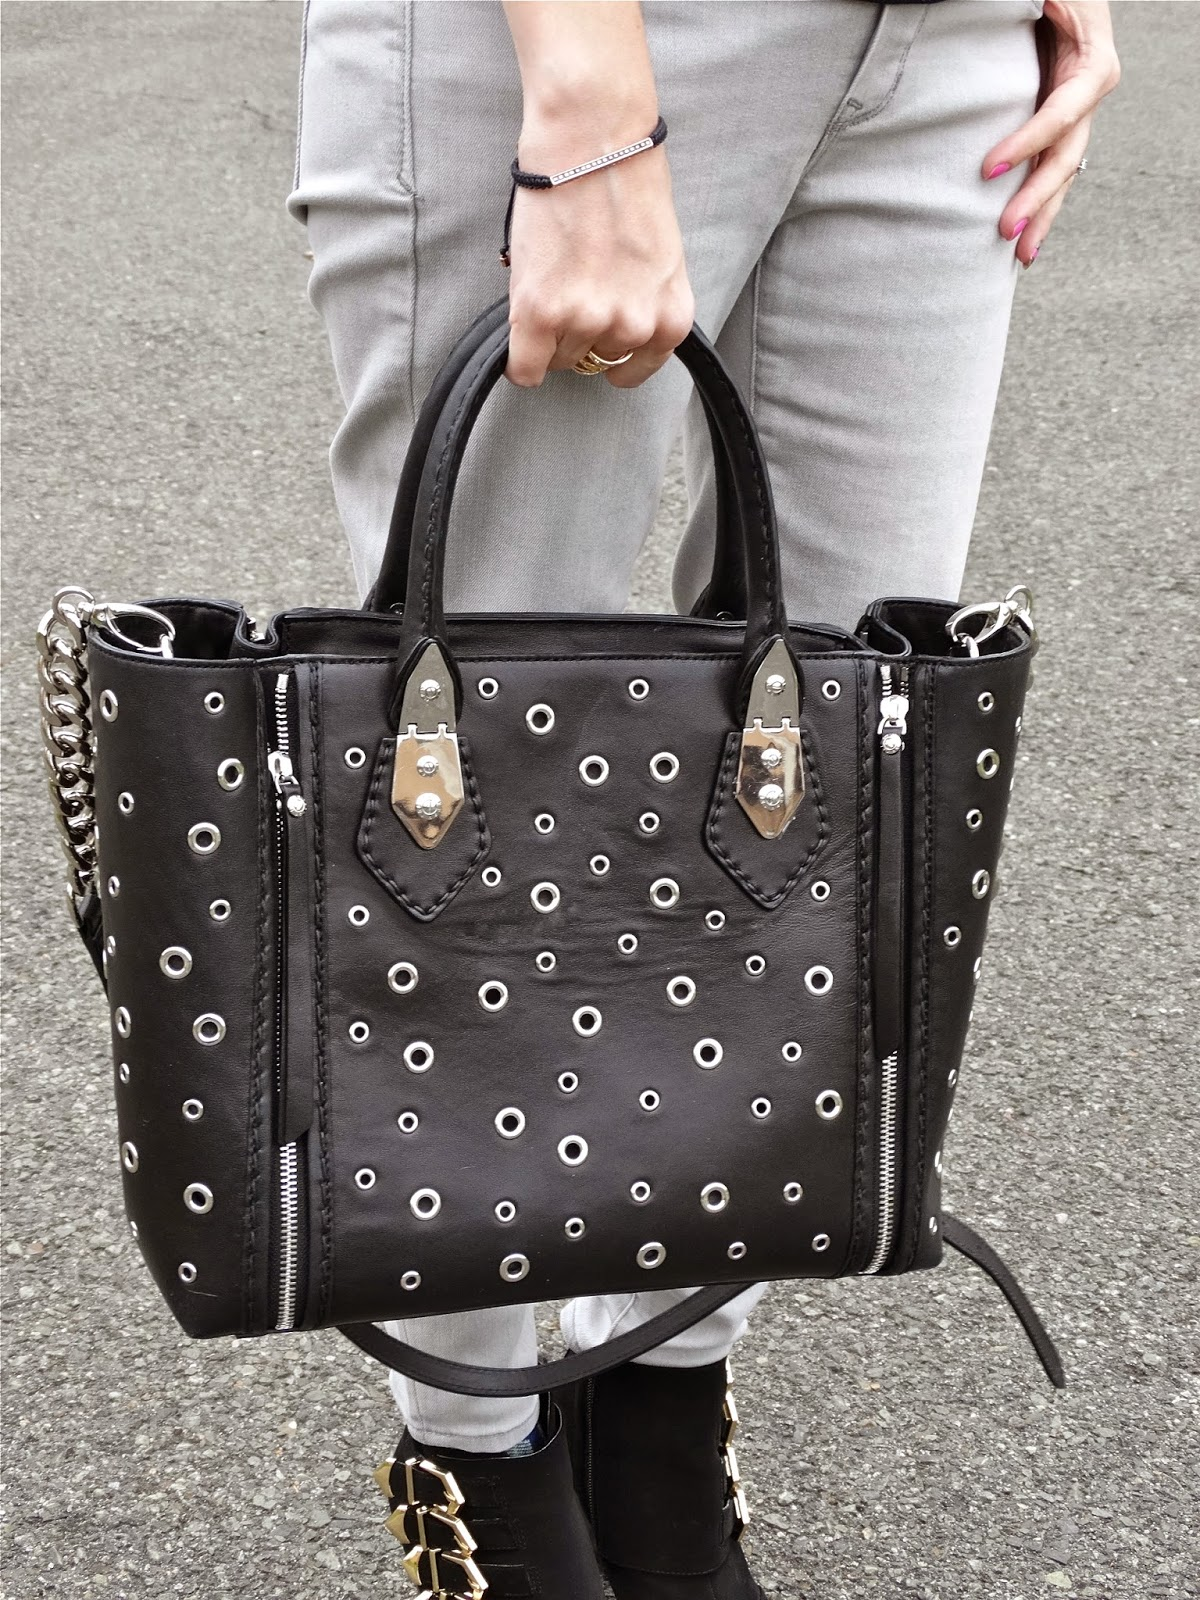 Henri Bendel A-List Bags | Styled by House Of Jeffers | www.houseofjeffers.com